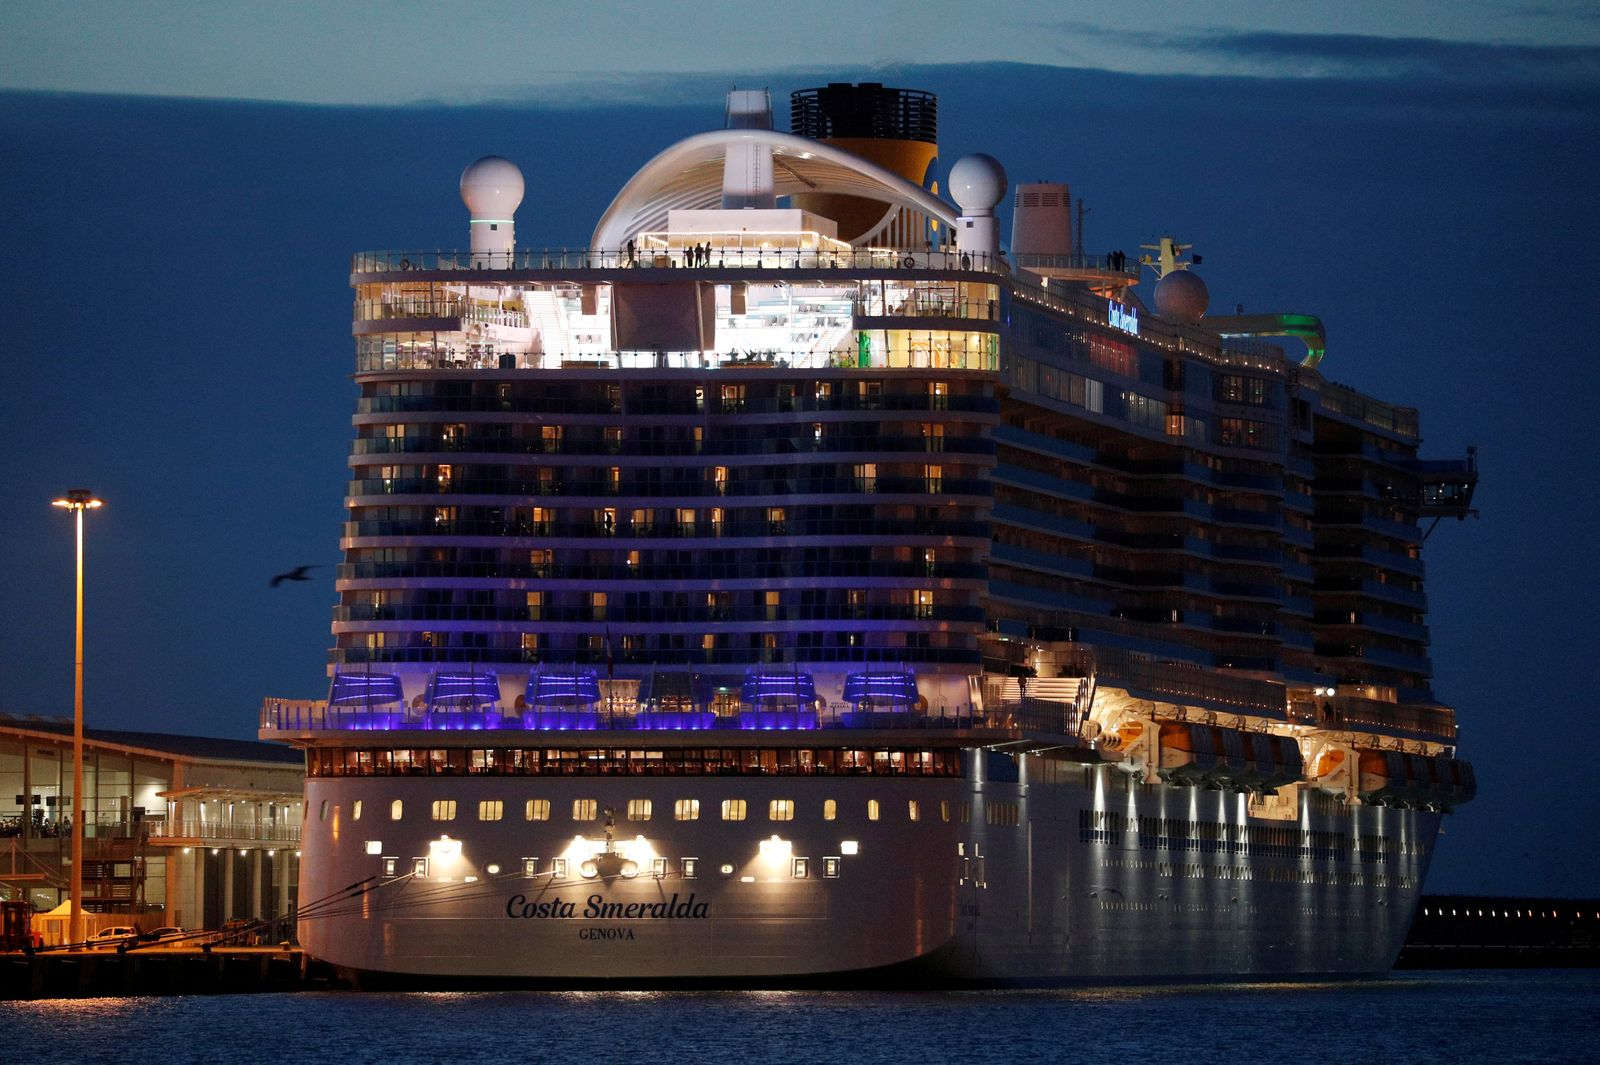 The Costa Smeralda cruise ship is docked at the Italian port of Civitavecchia